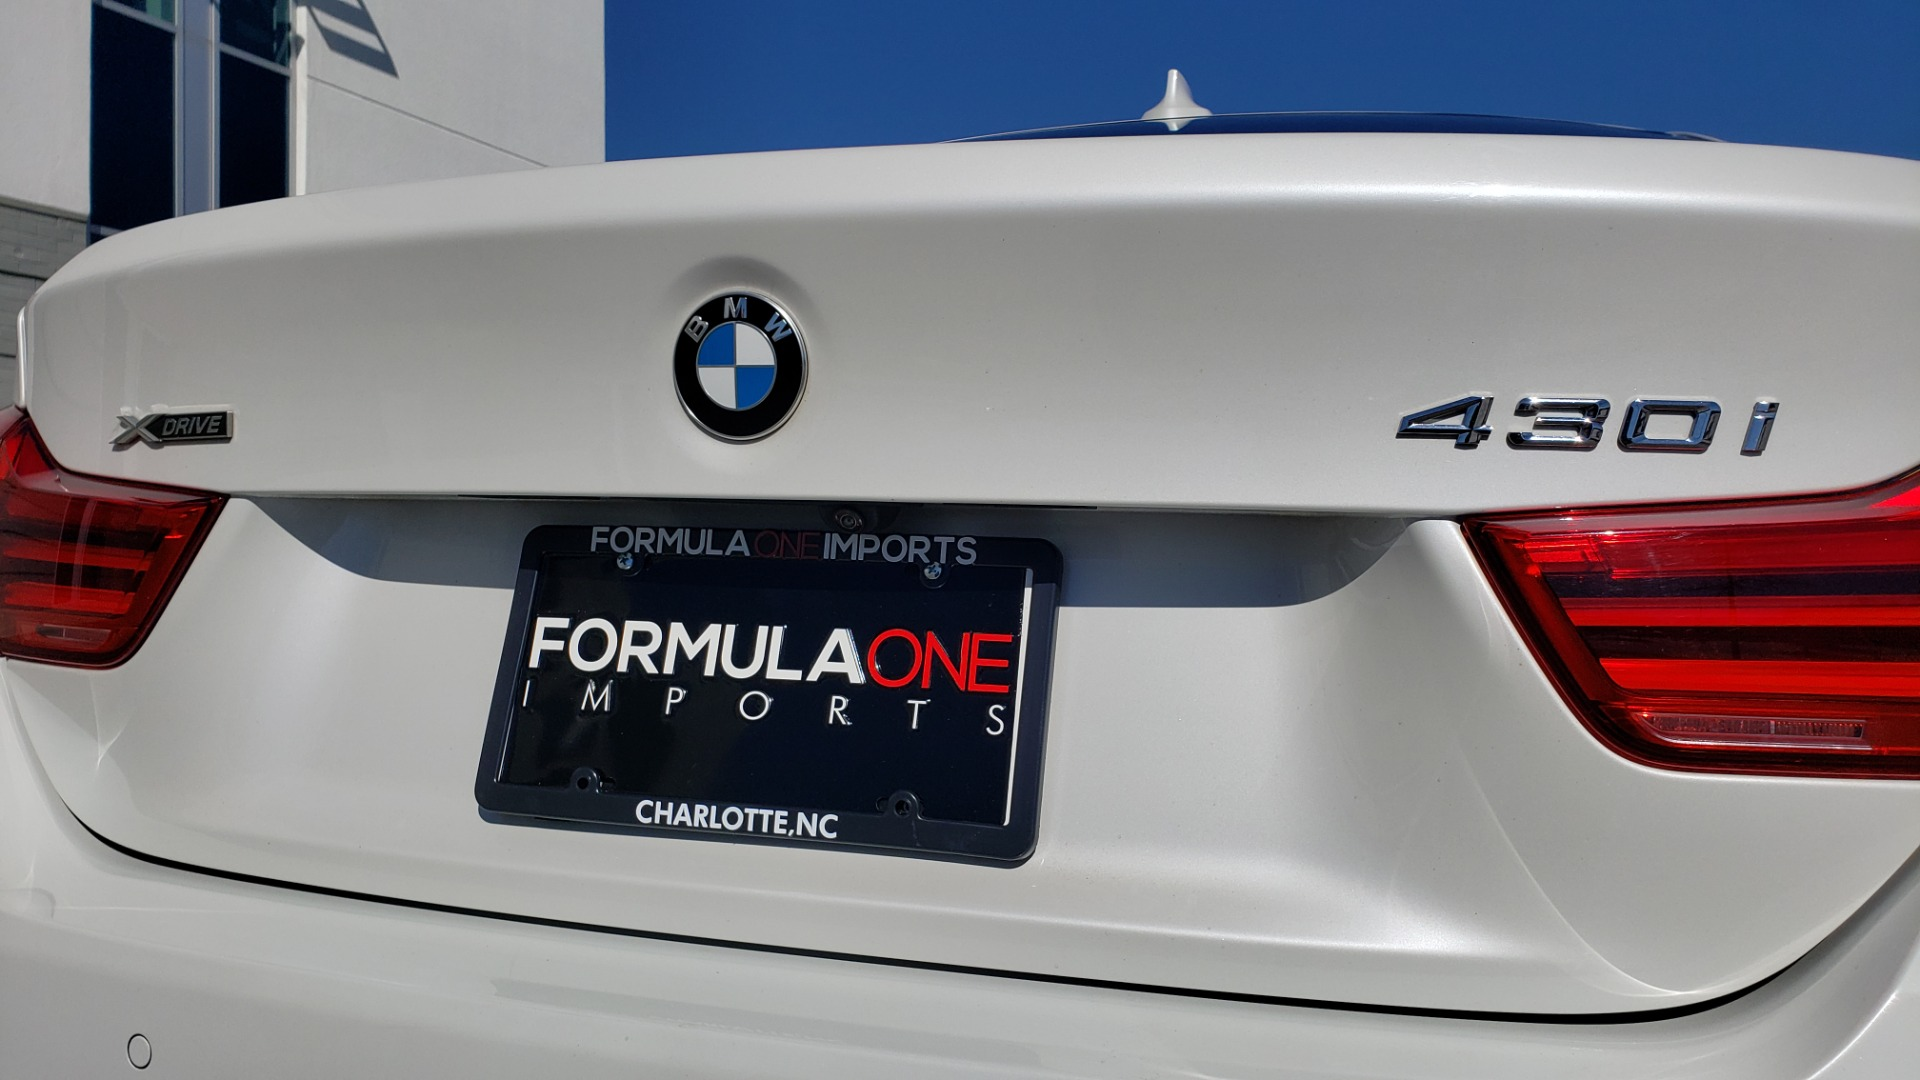 Used 2018 BMW 4 SERIES 430IXDRIVE / PREMIUM / NAV / SUNROOF / ESSENTIALS PKG for sale $28,995 at Formula Imports in Charlotte NC 28227 24